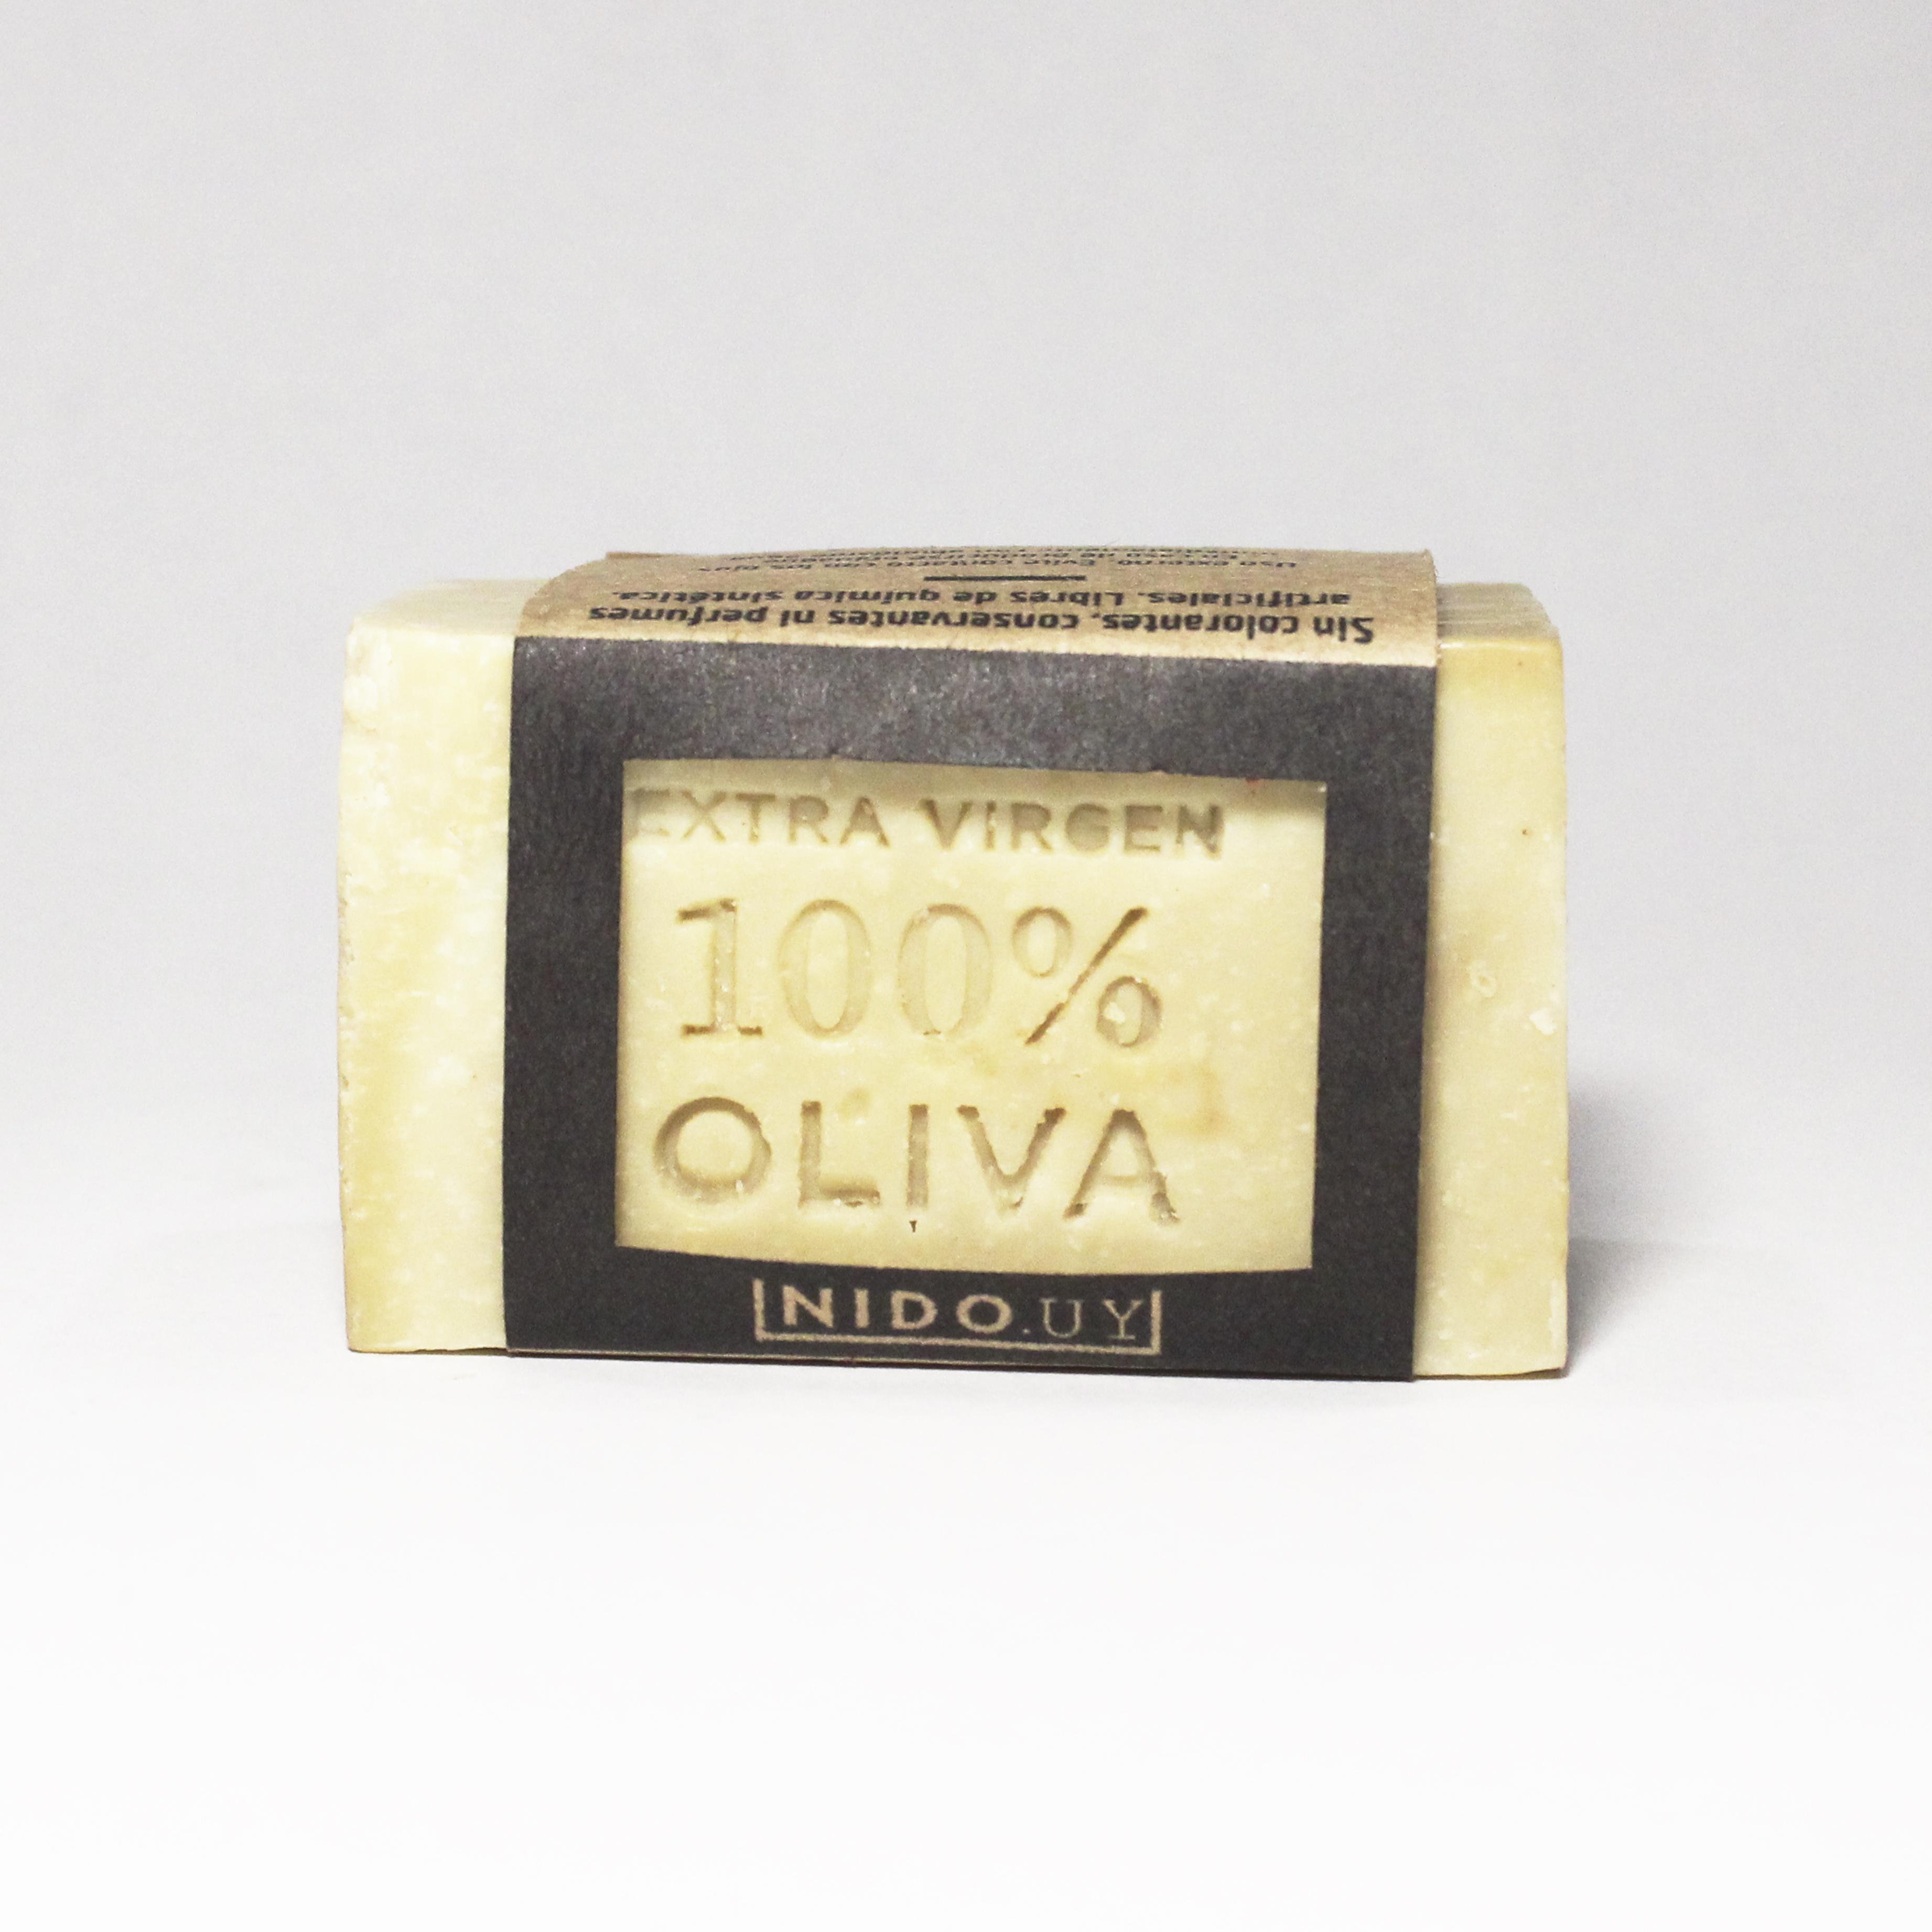 Jabones 100% oliva